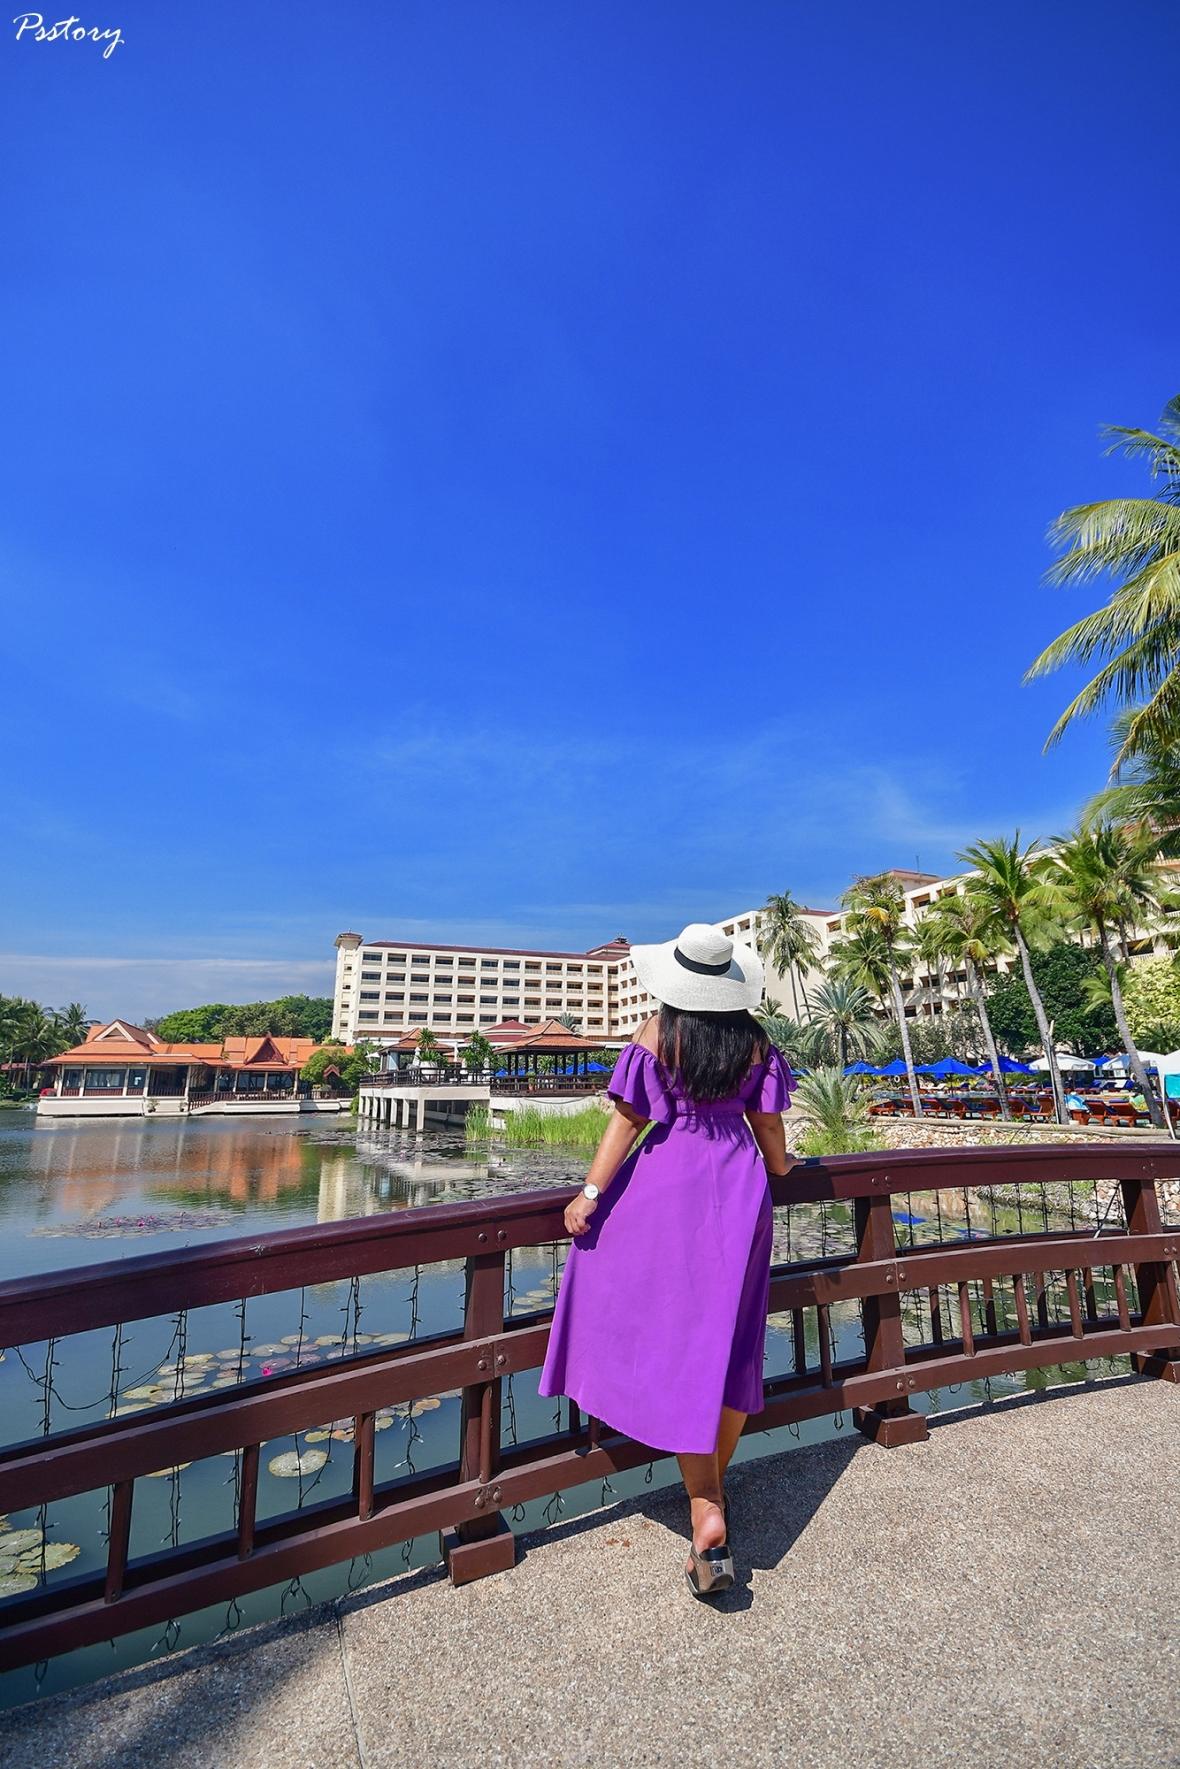 Dusit Thani Hua Hin Hotel (149)